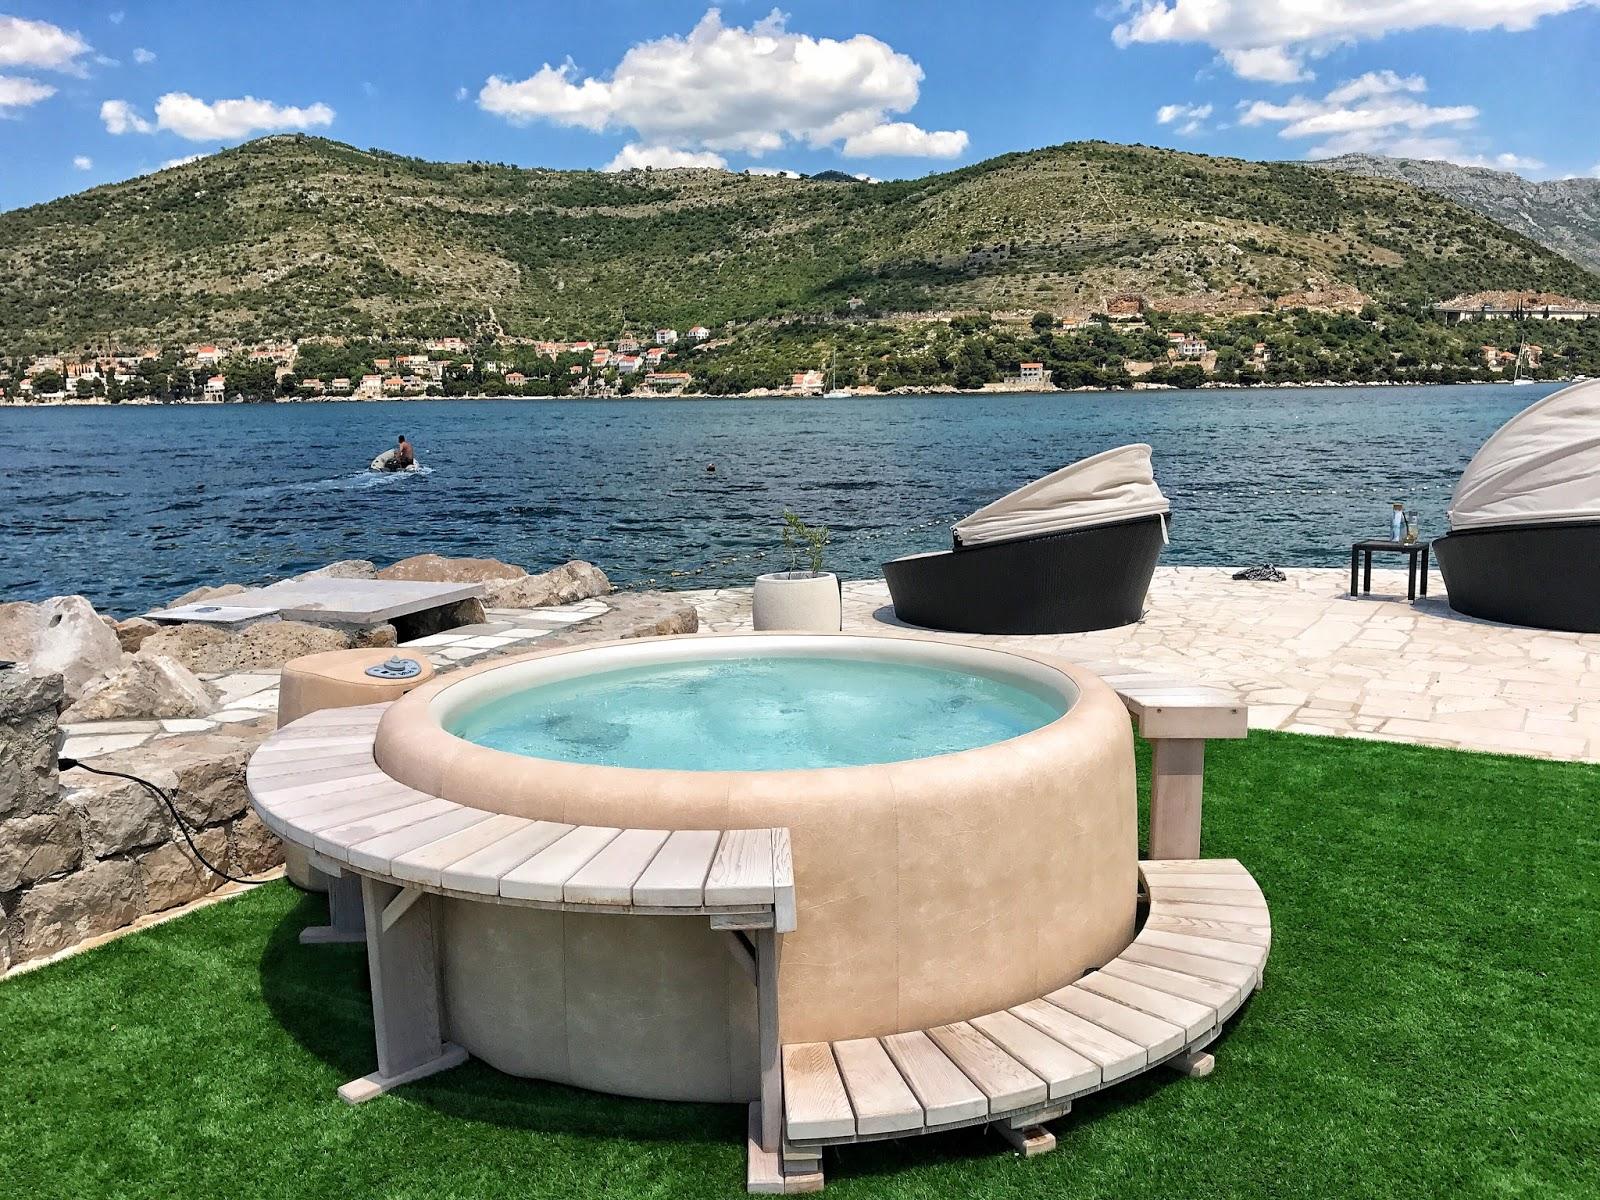 hot tub Copacana beach Dubrovnik Croatia